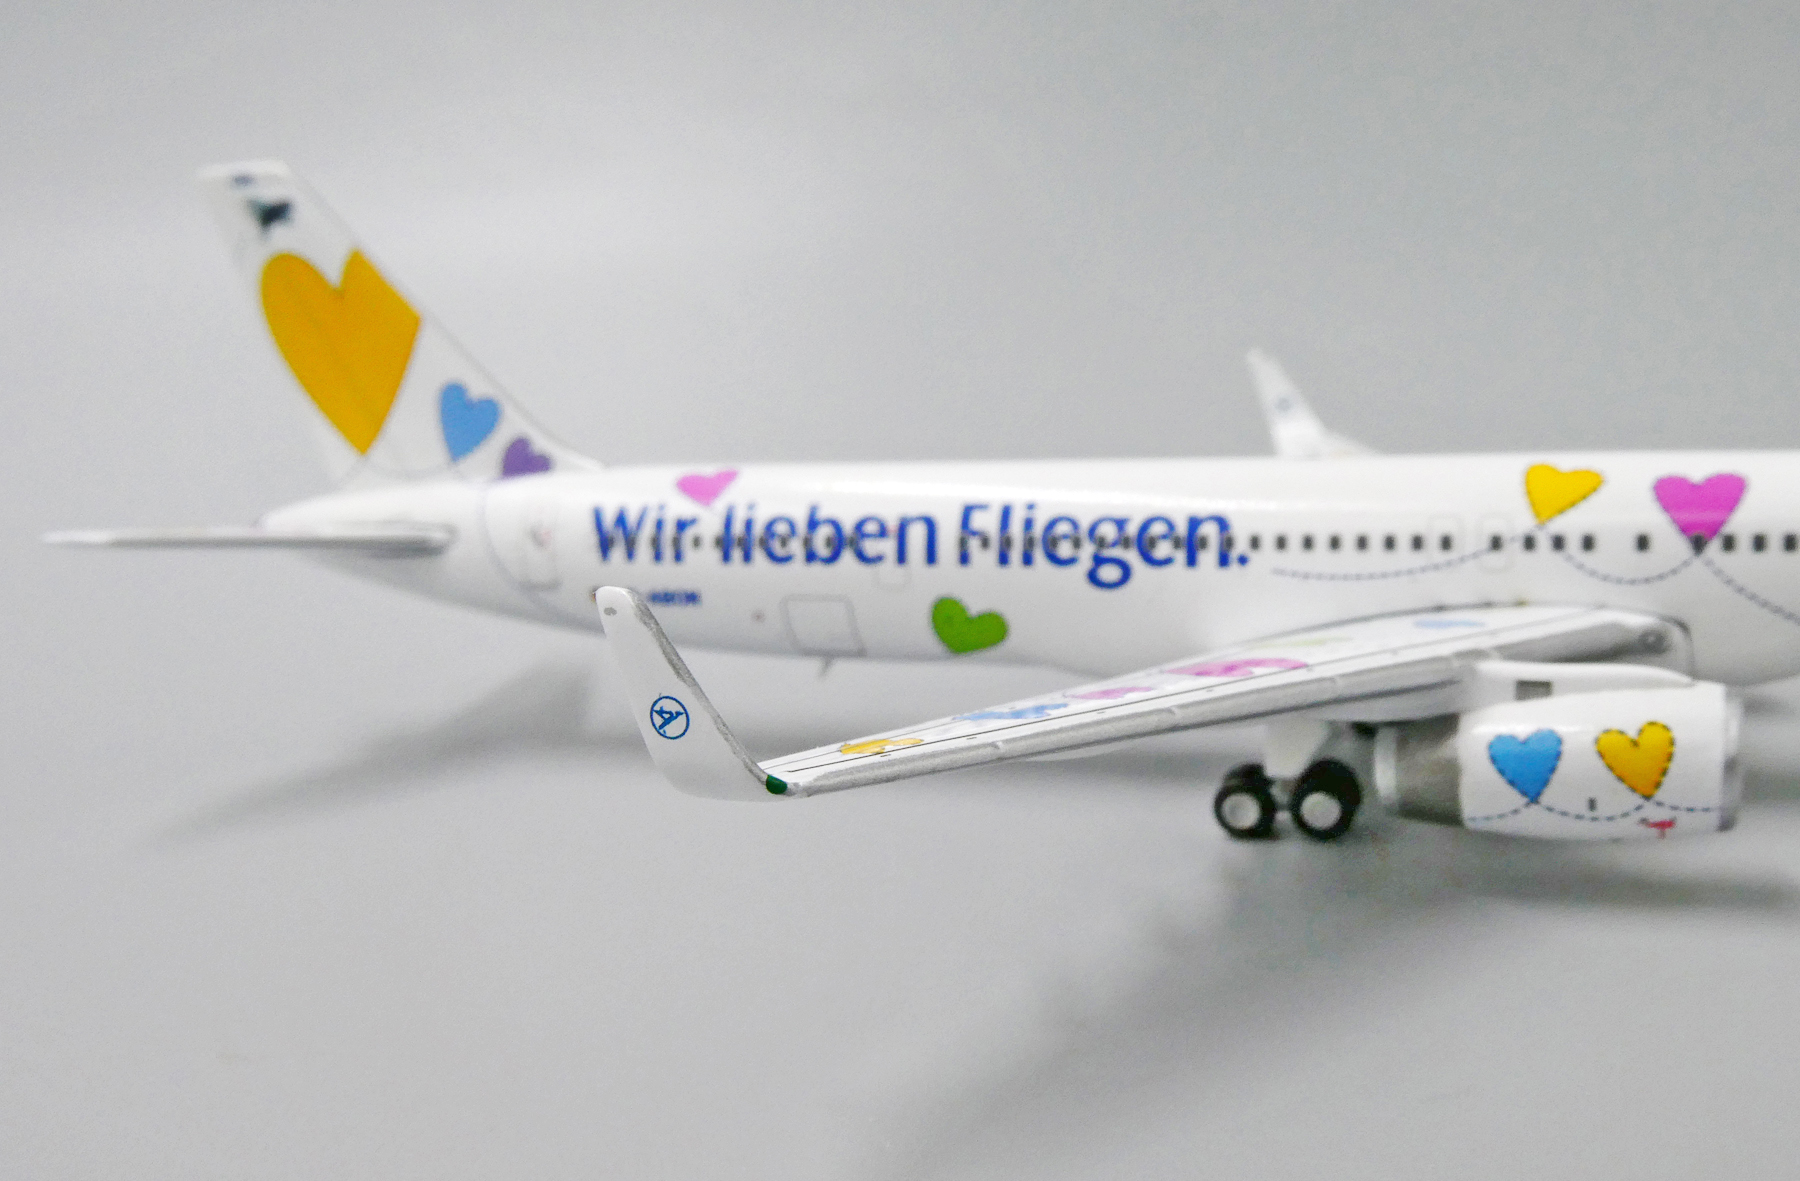 JC Wings JCW4154 1:400 Condor Boeing 757-300 pre-Painted//pre-Built W Reg #D-ABON Wir lieben Fliegen Livery